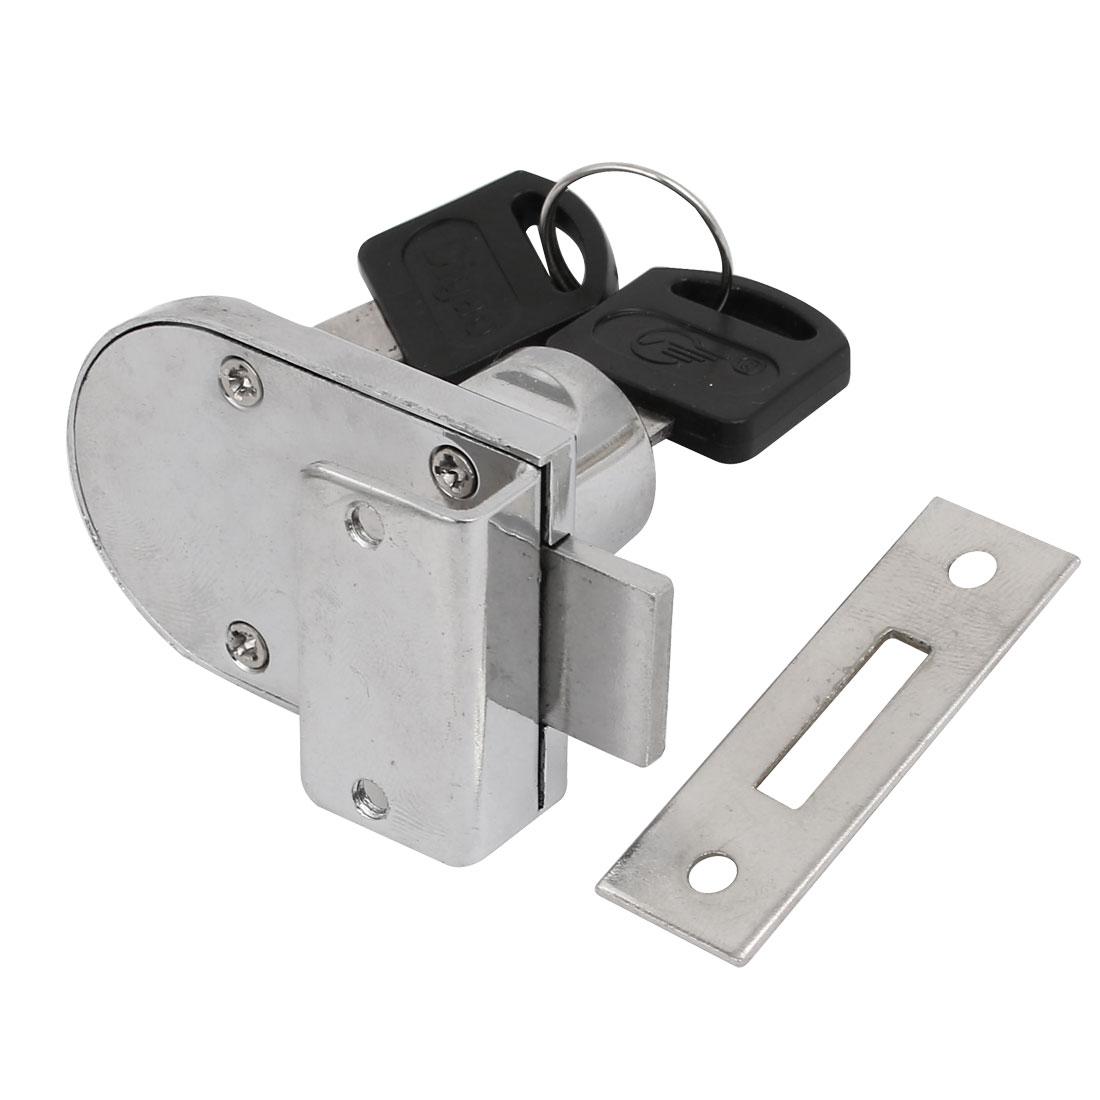 Unique Bargains Glass Door Showcase Metal Screw Mounted Security Lock 9mm Thickness w 2 Keys - image 3 de 4